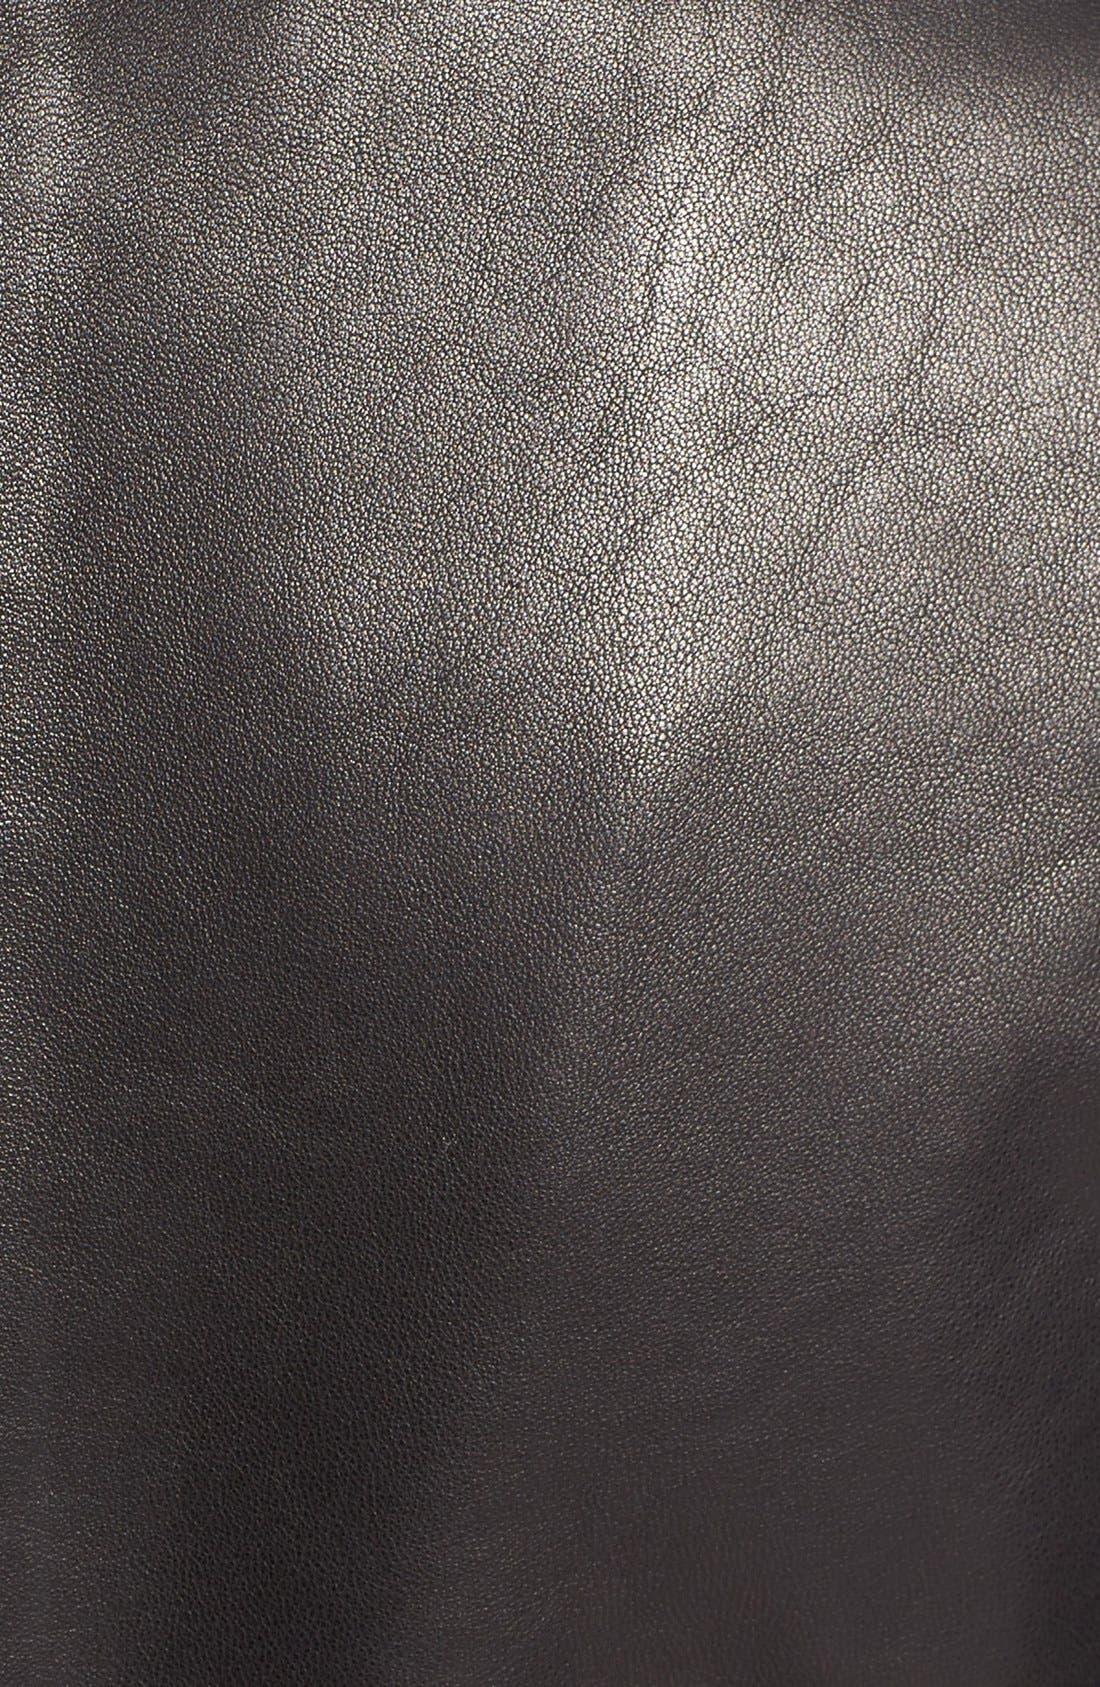 Mixed Media Leather Moto Jacket,                             Alternate thumbnail 5, color,                             Black